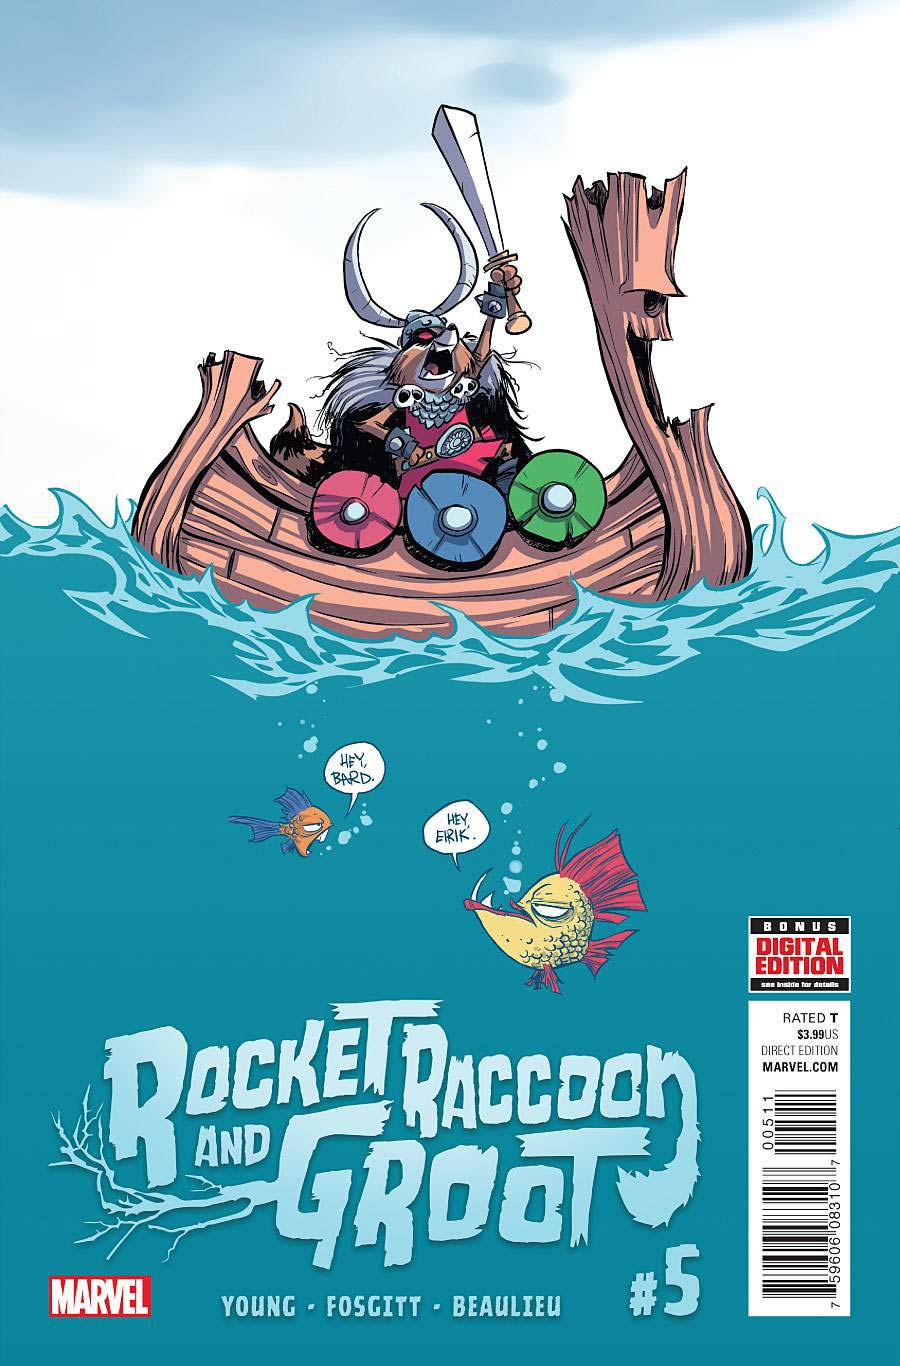 Rocket Raccoon And Groot #5